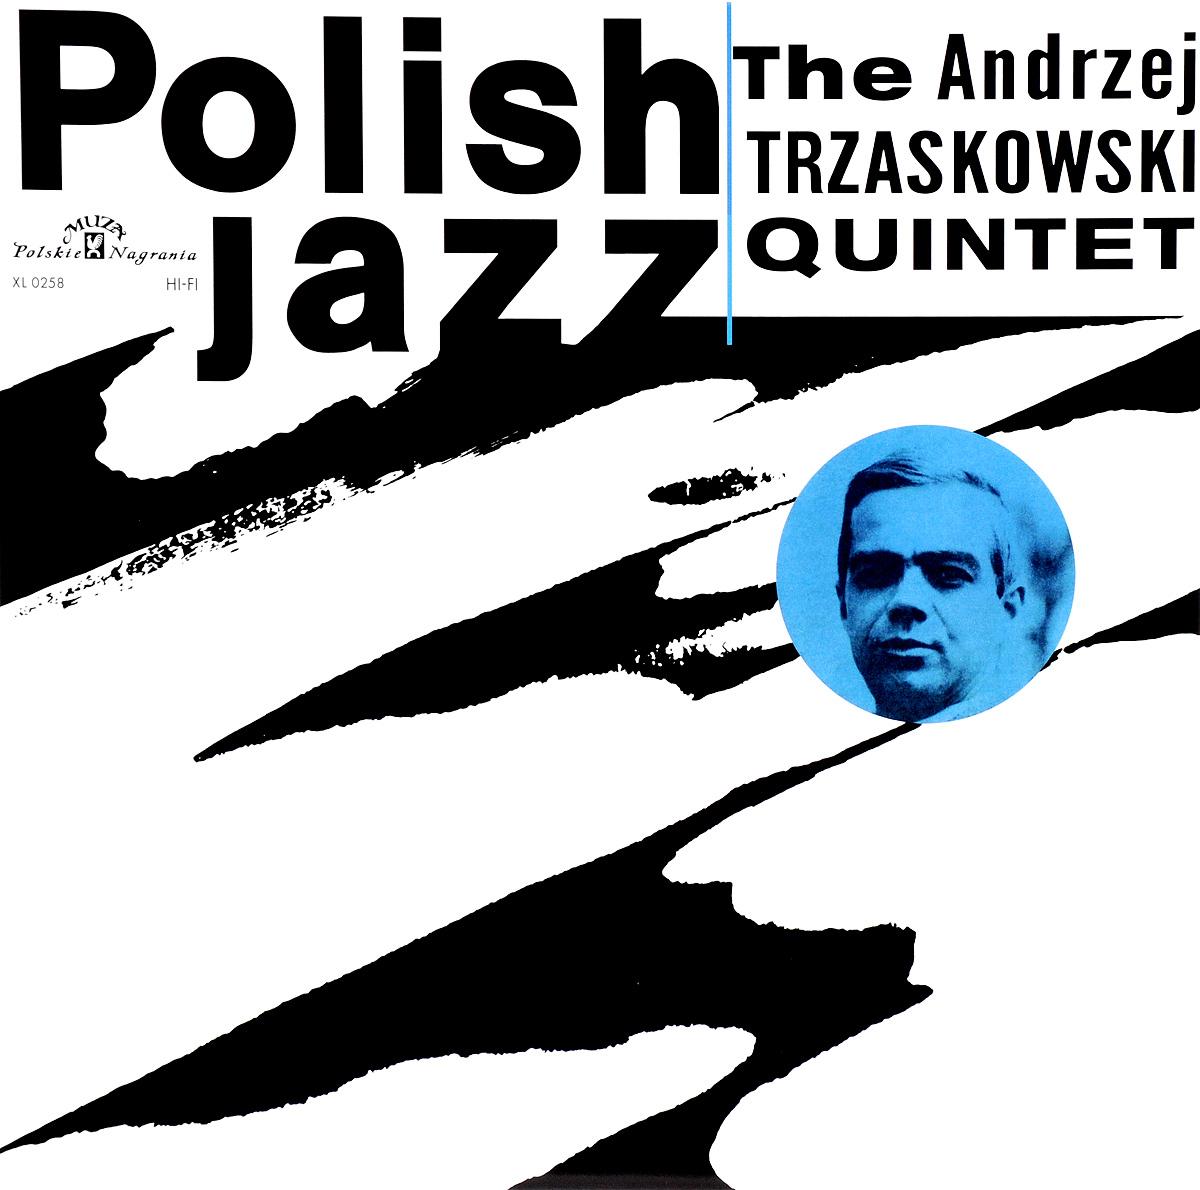 The Andrzej Trzaskowski Quintet Polish Jazz. The Andrzej Trzaskowski Quintet (LP) art blakey quintet art blakey quintet a night at birdland volume 2 lp